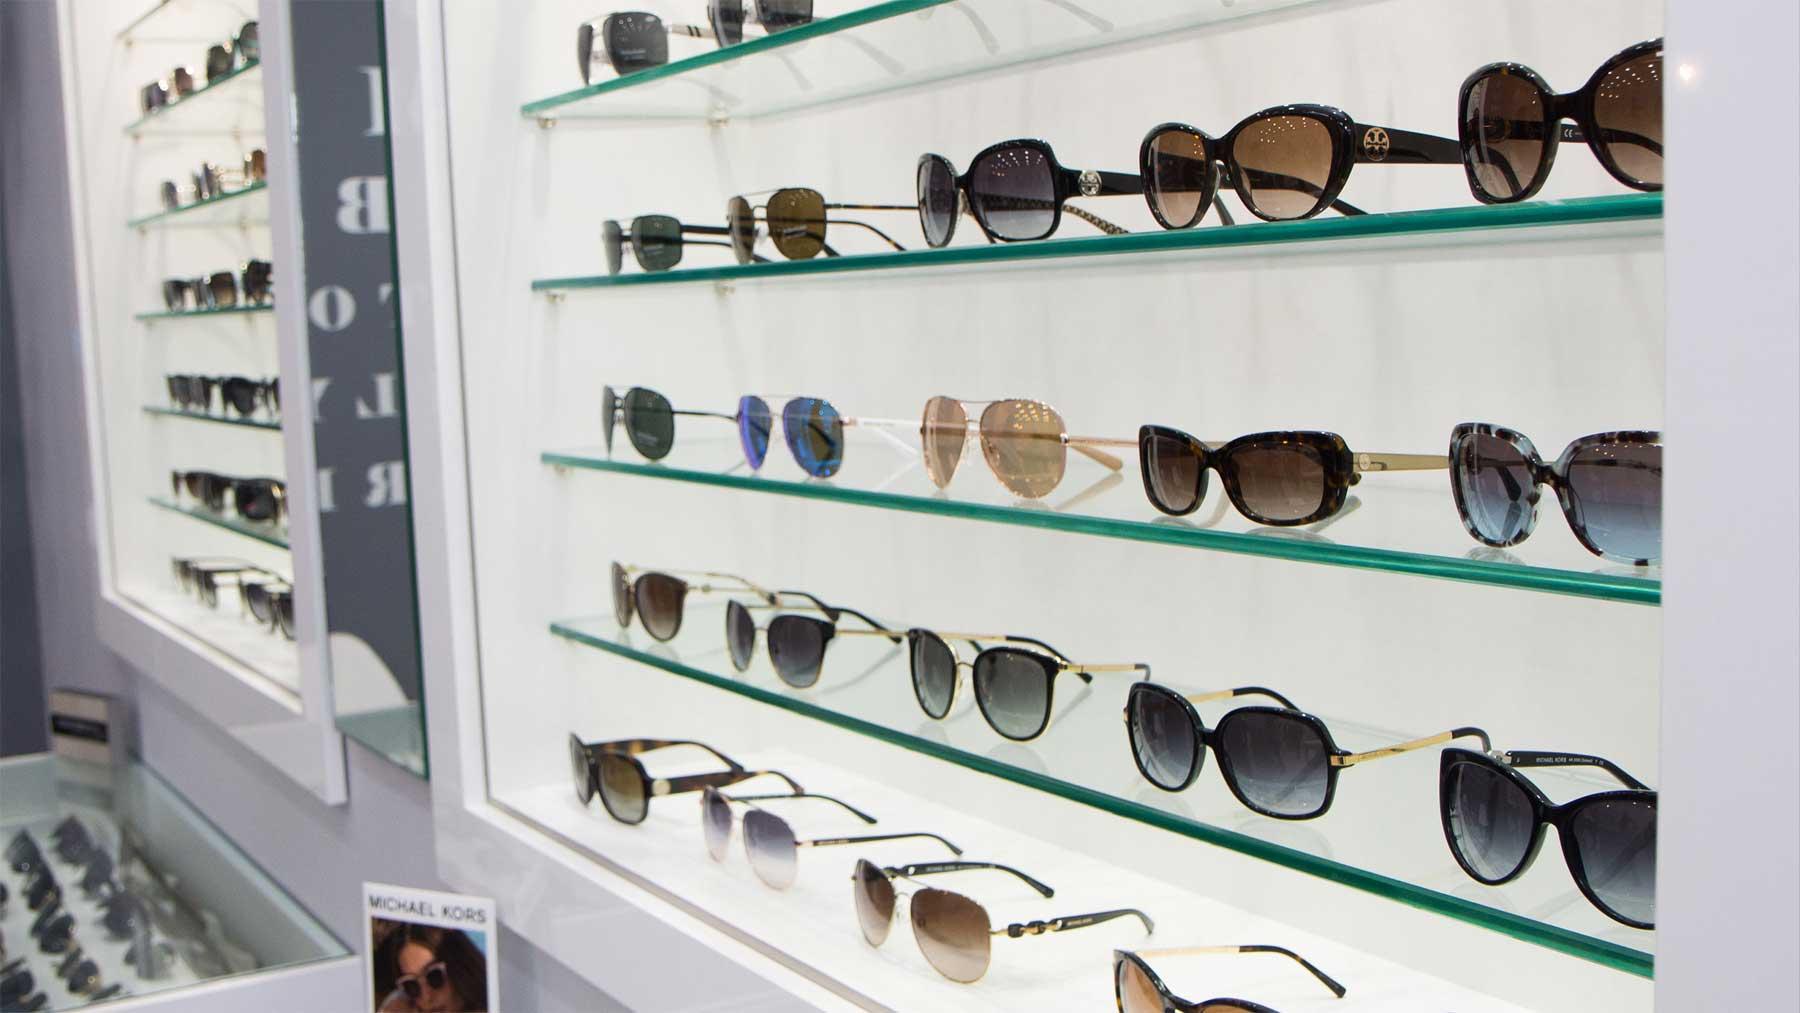 9-Sunglasses-at-Brampton-Family-Eye-Care